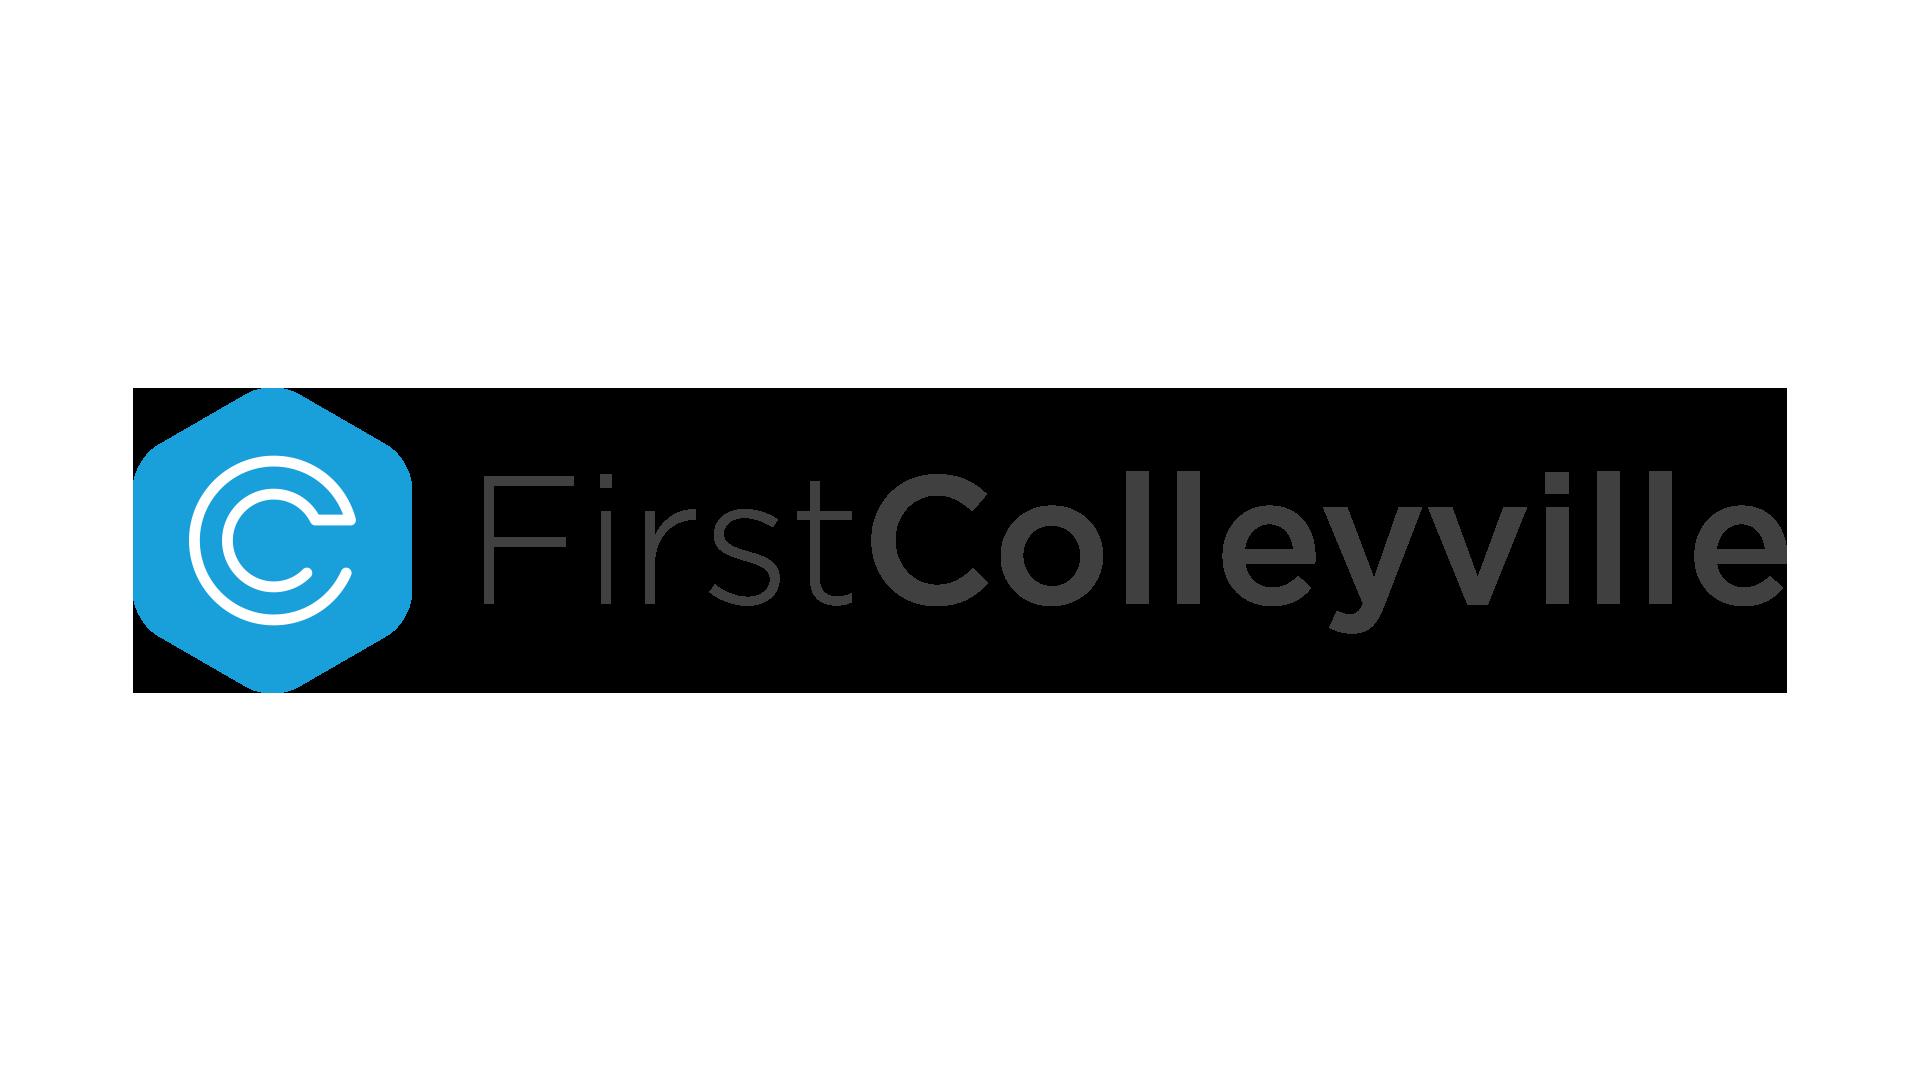 First Colleyville